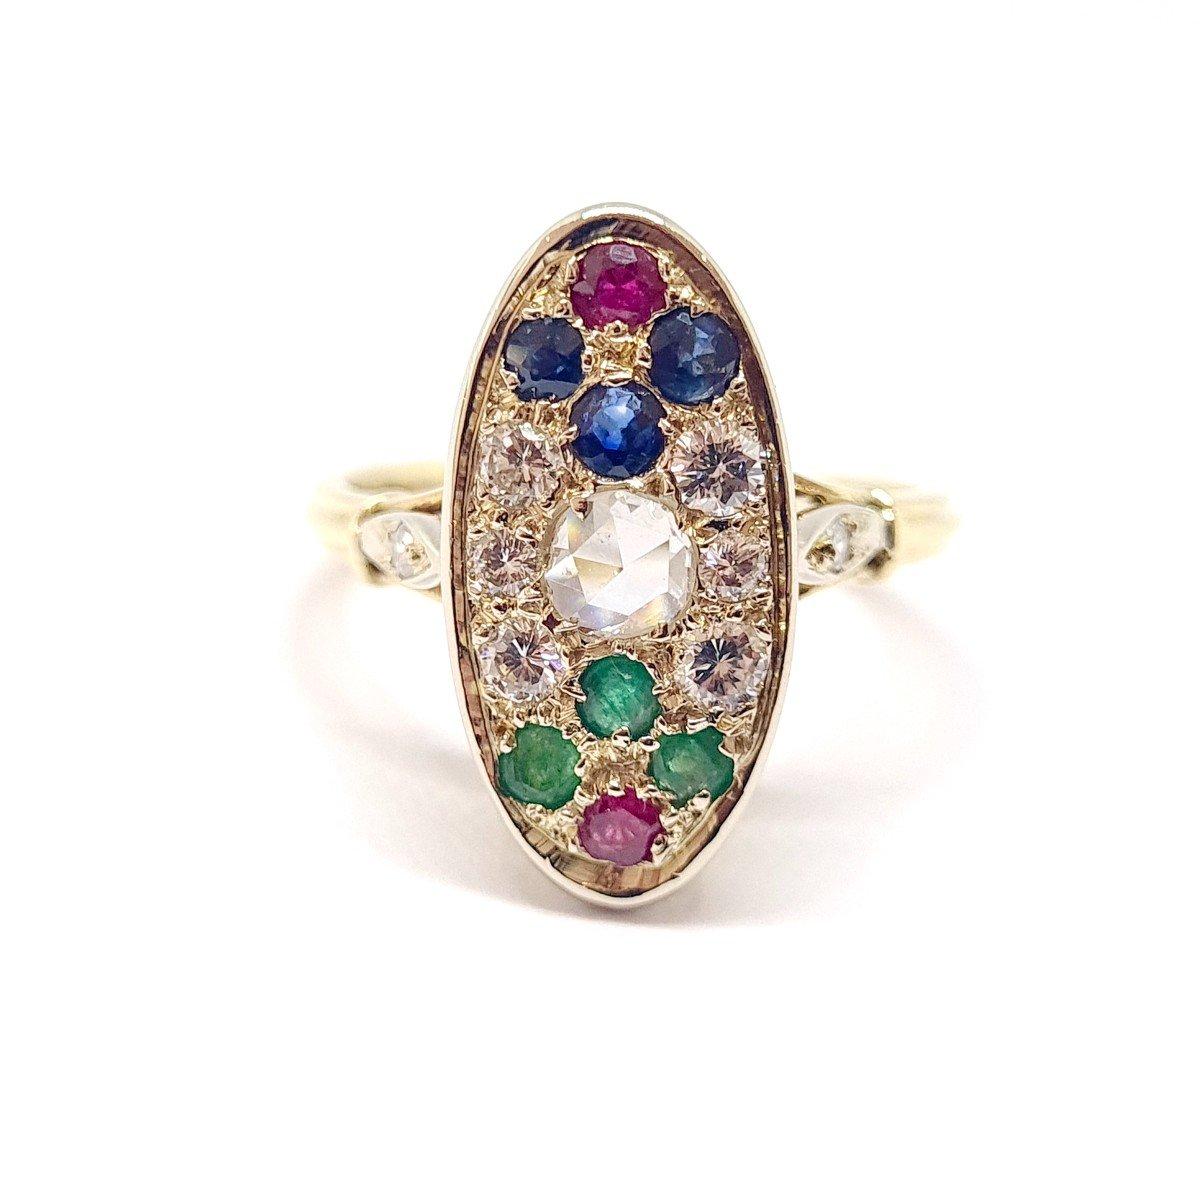 Bague Ancienne Or Jaune 18 Carats Diamants Saphirs Rubis émeraudes